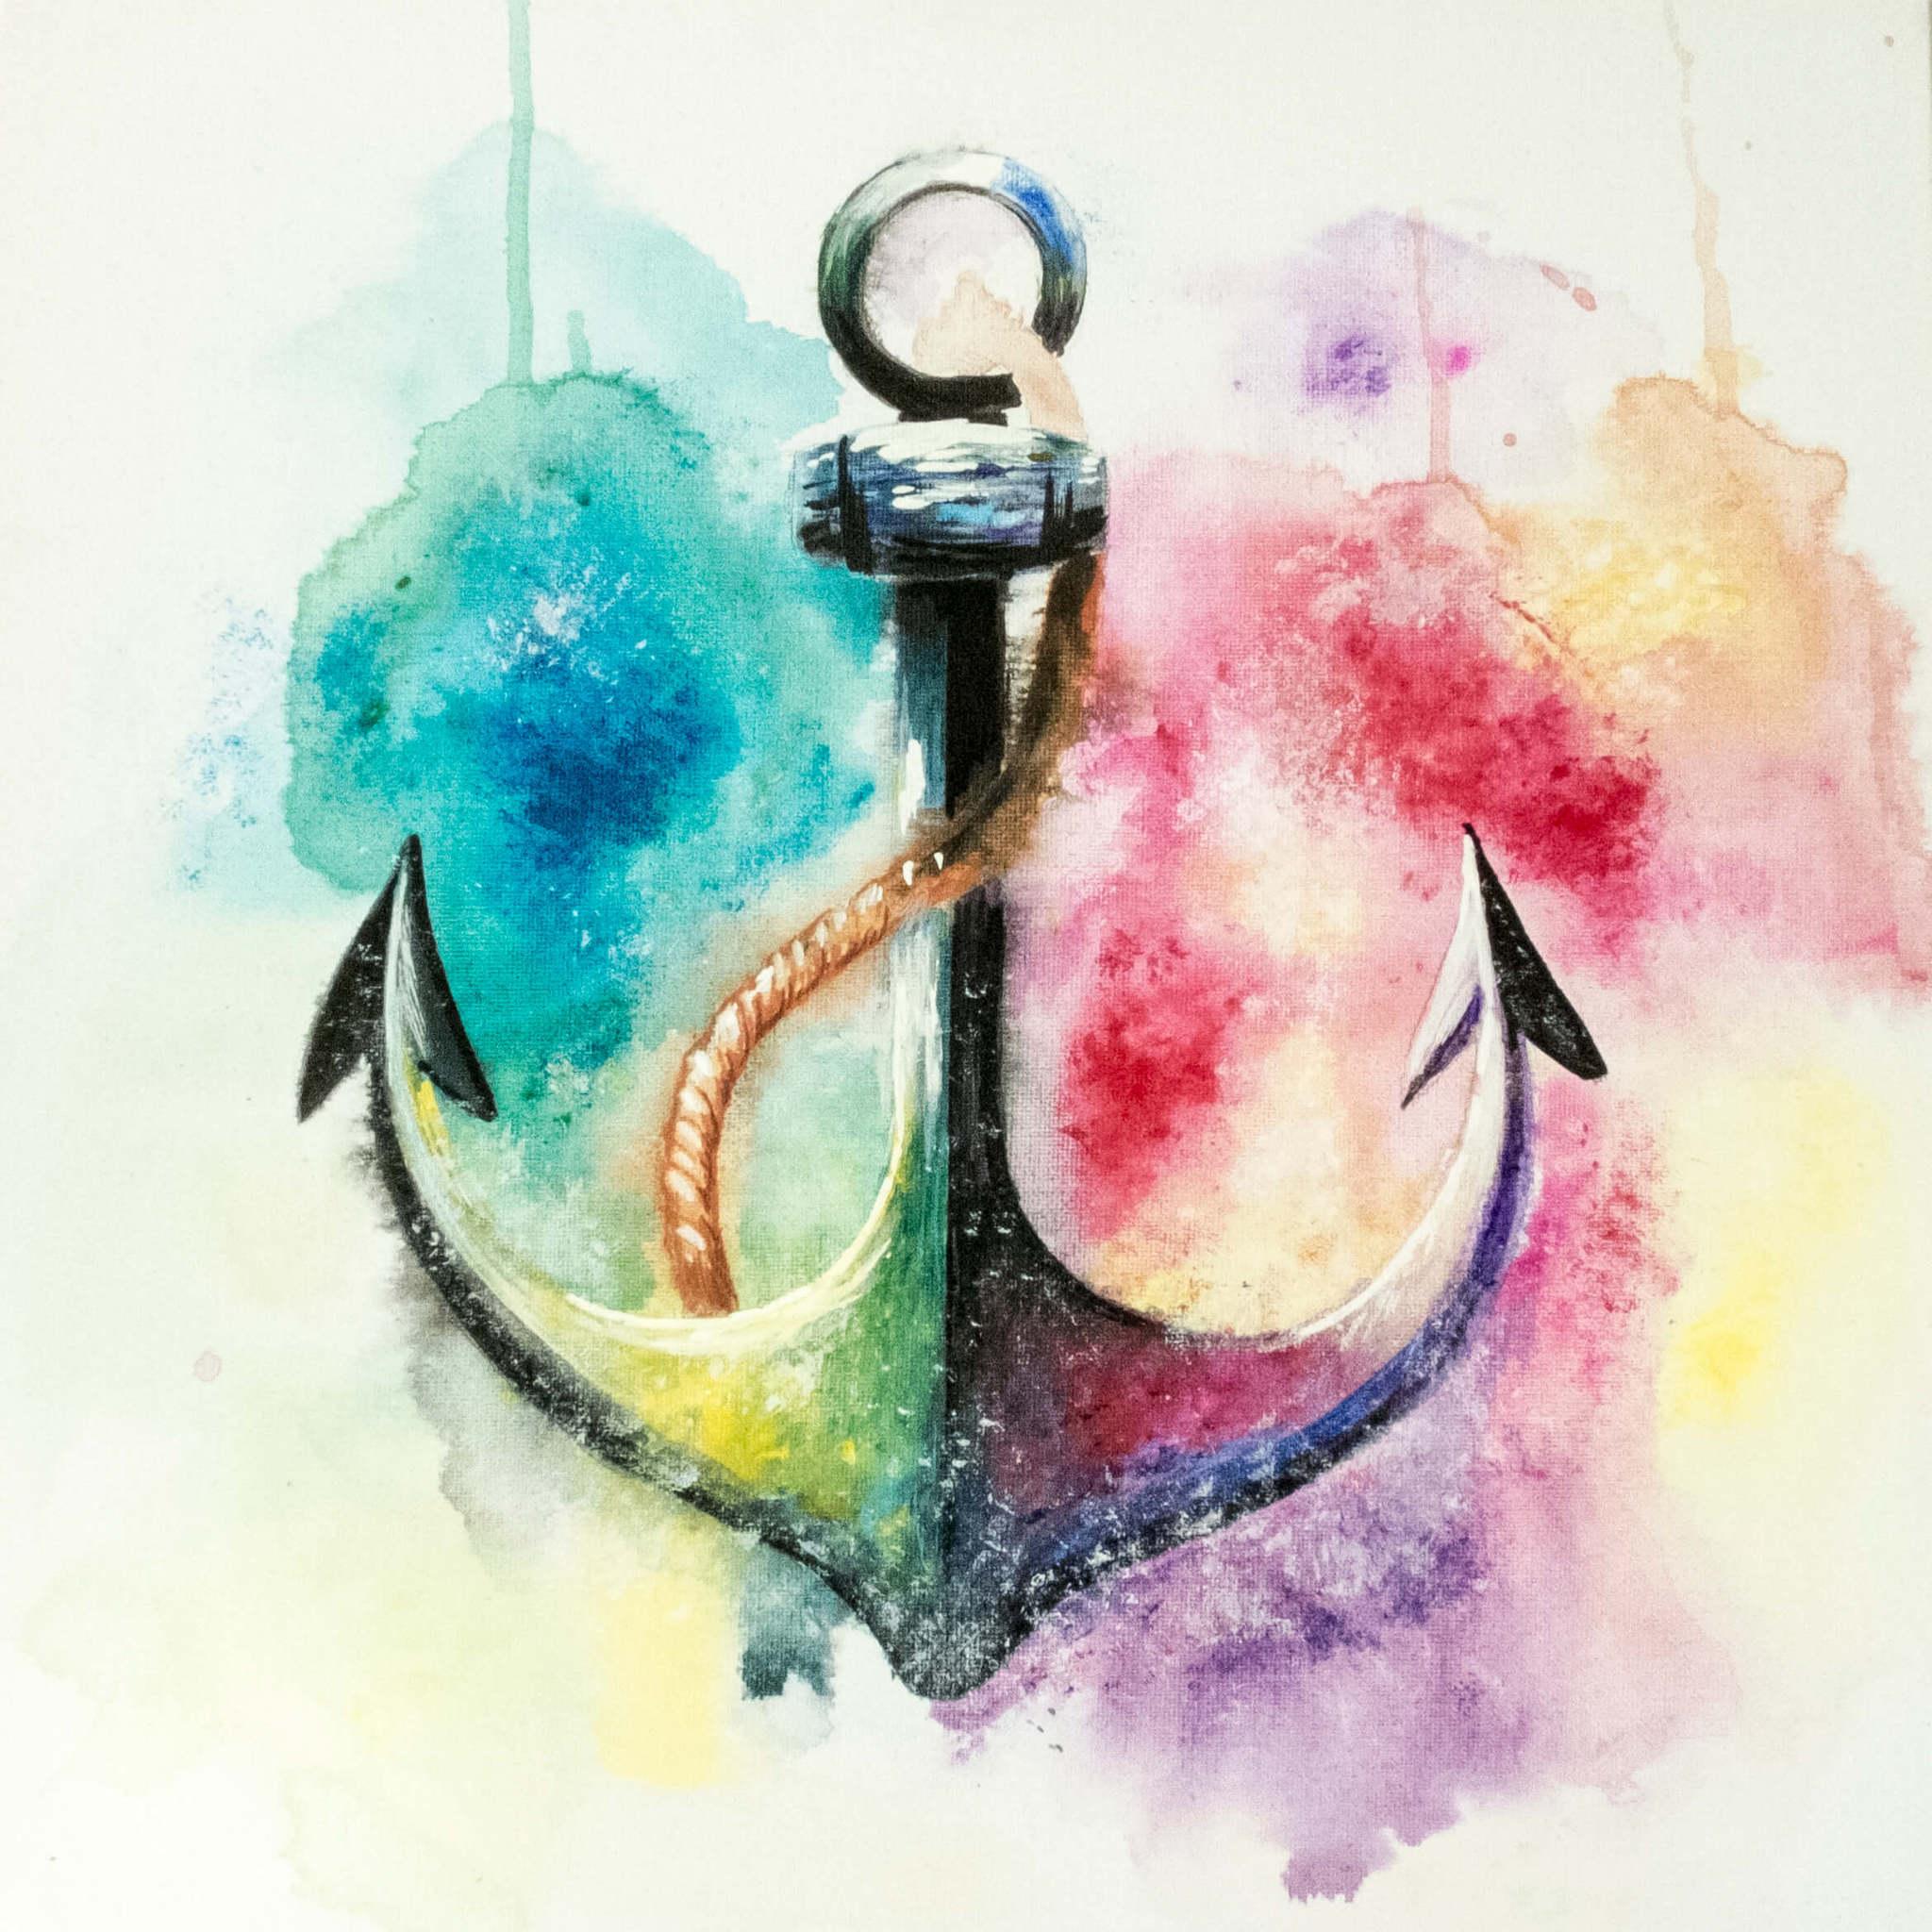 Соль для ванны: крымская розовая